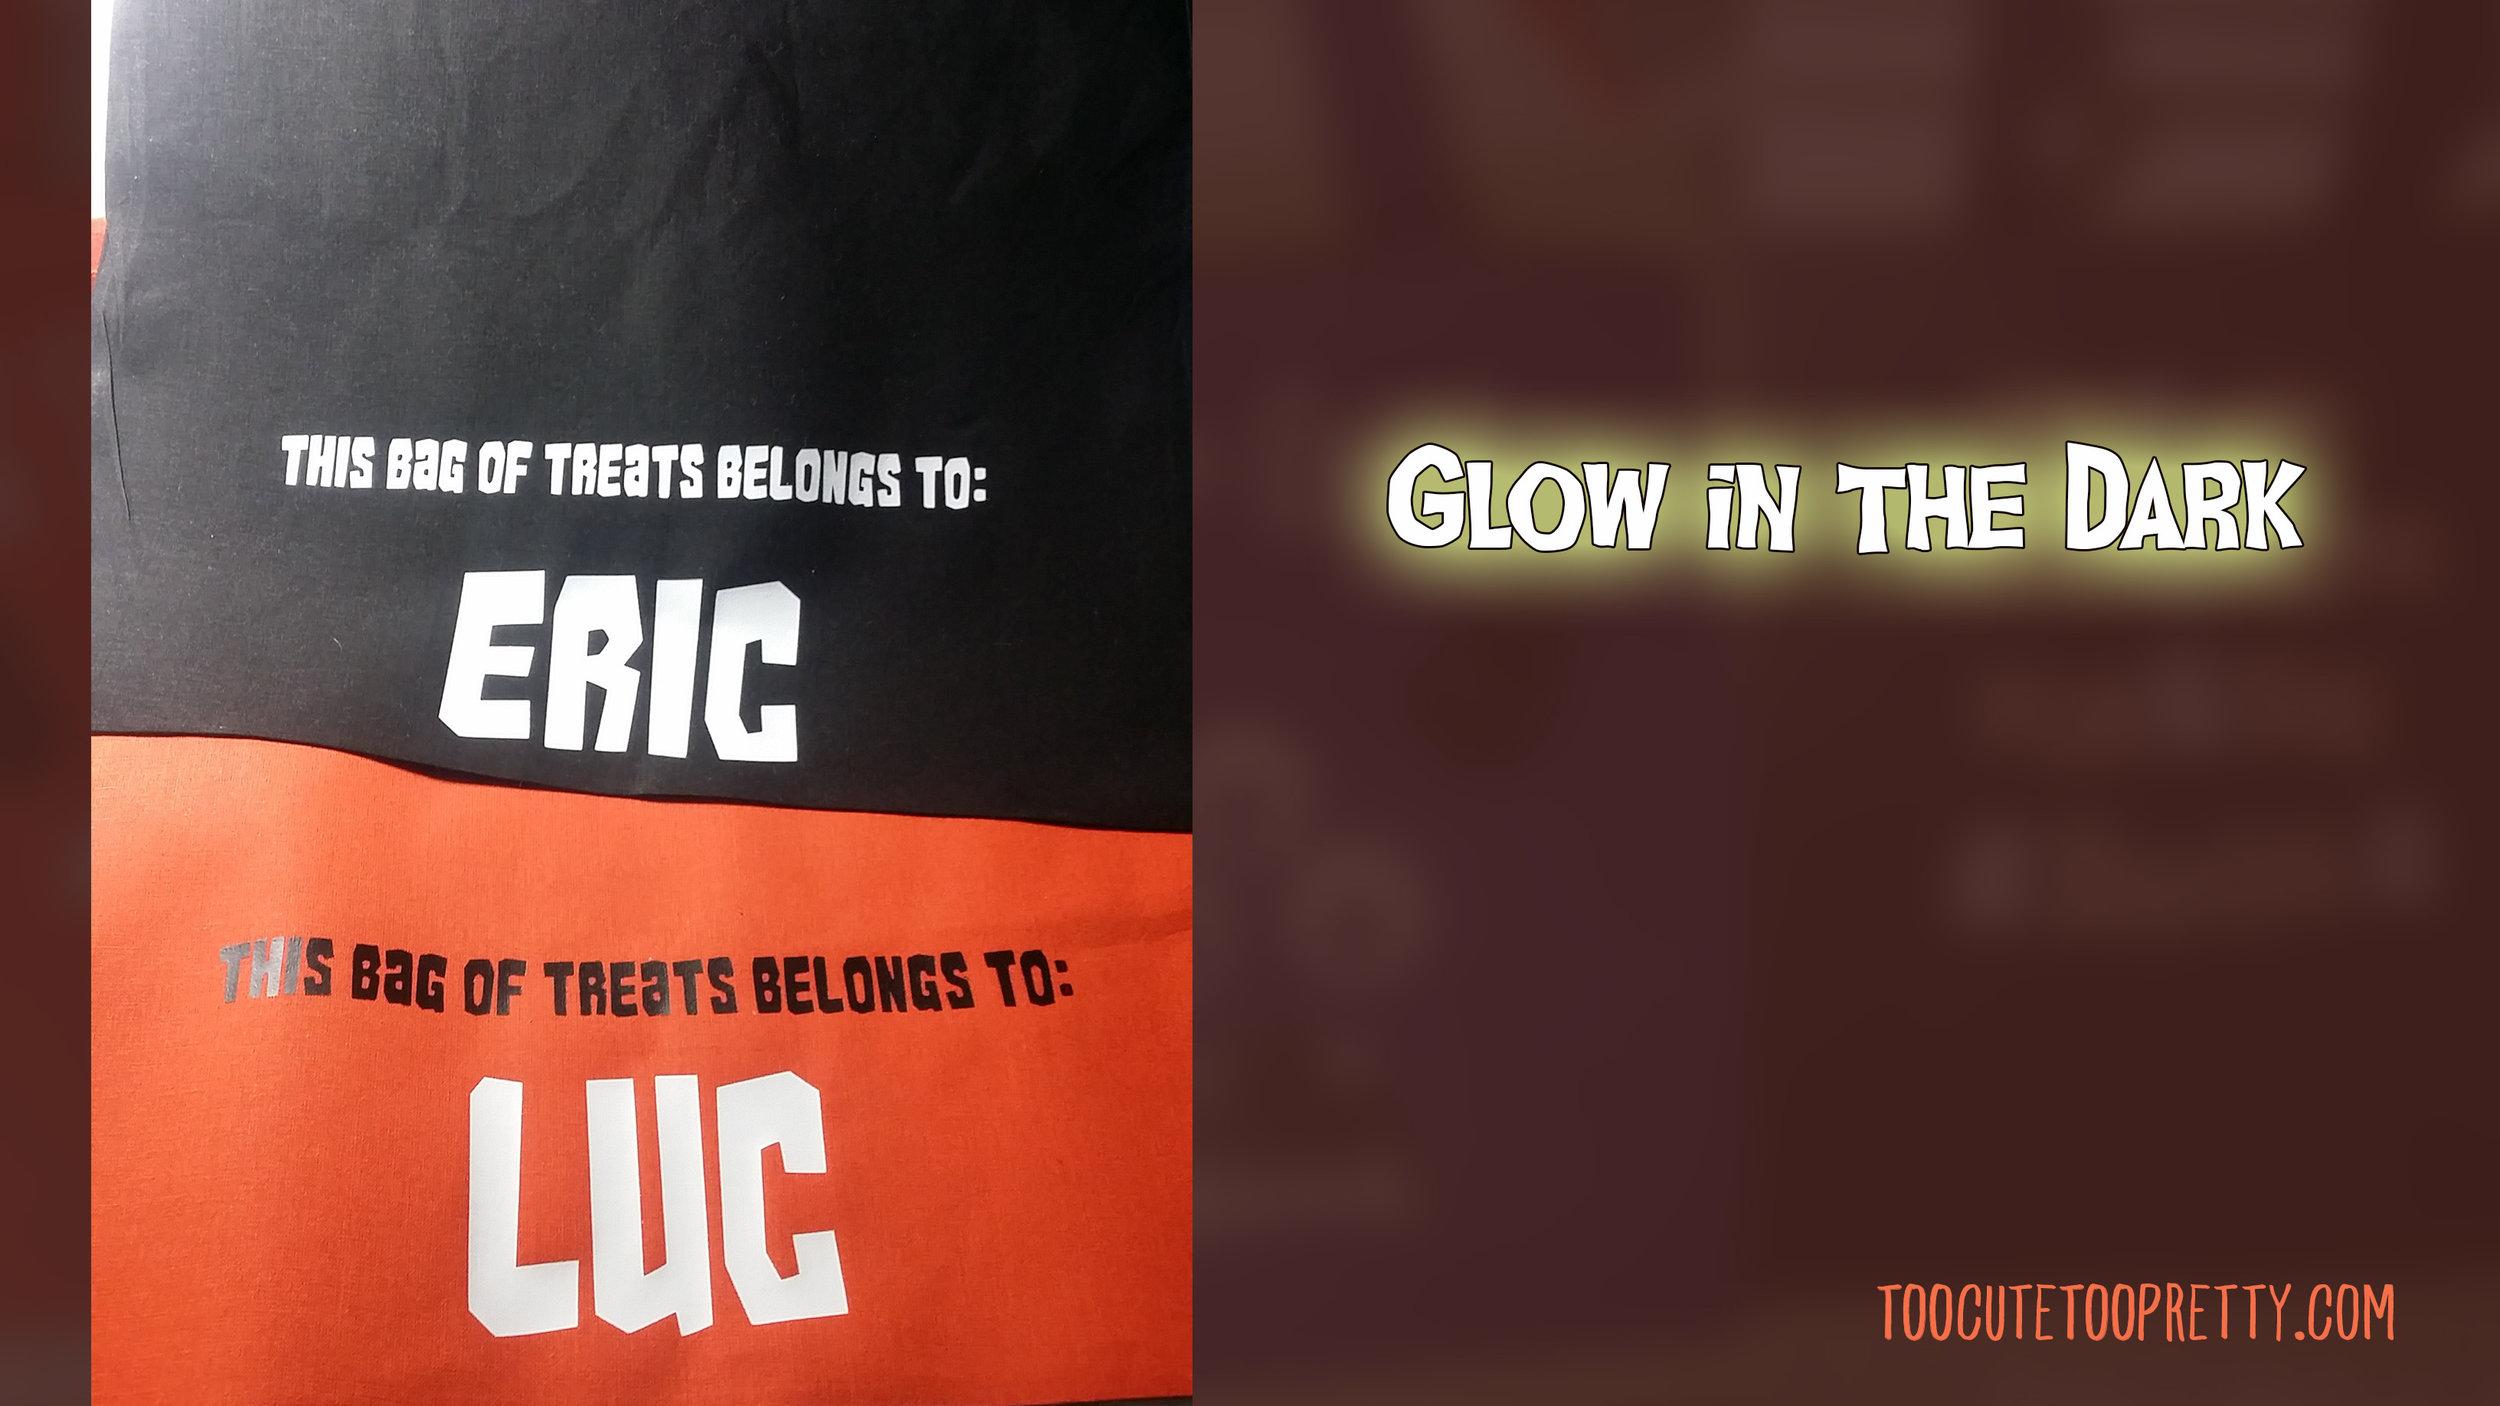 GlowInTheDark.jpg